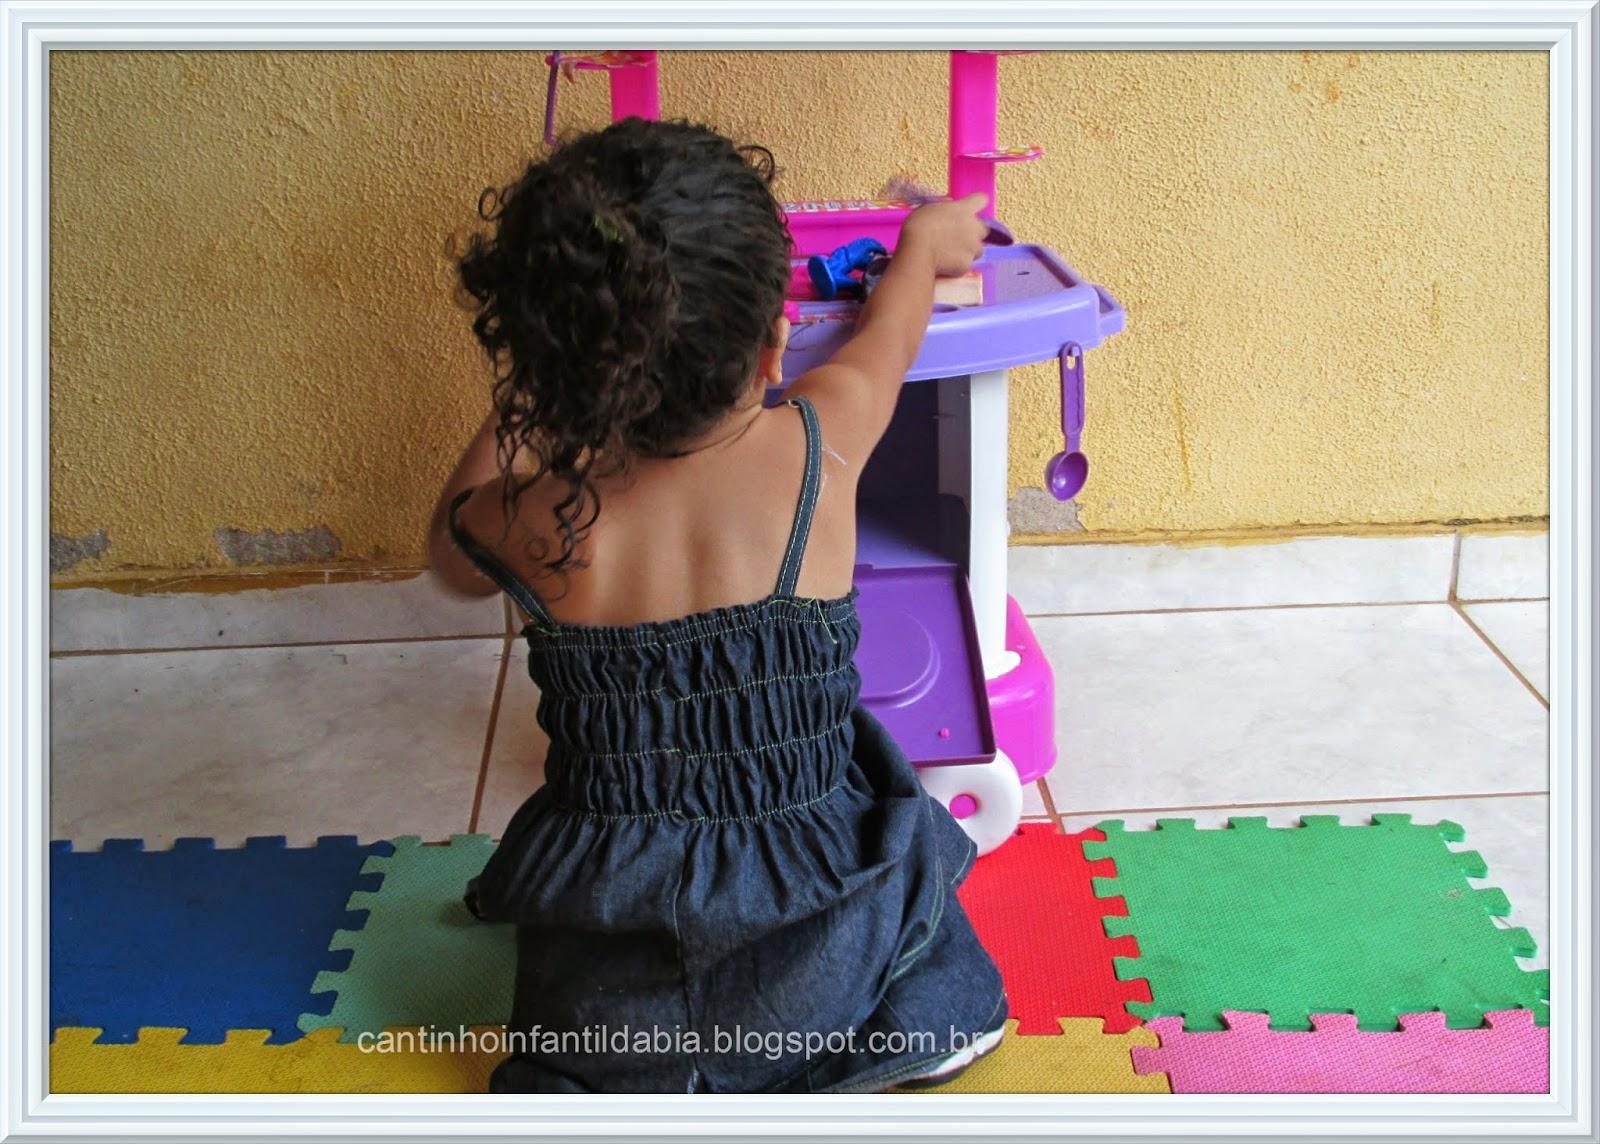 juguetes niñas / juegos de cocina / cocina juego / juegos para niños / juguetes laura / cocina de color rosa